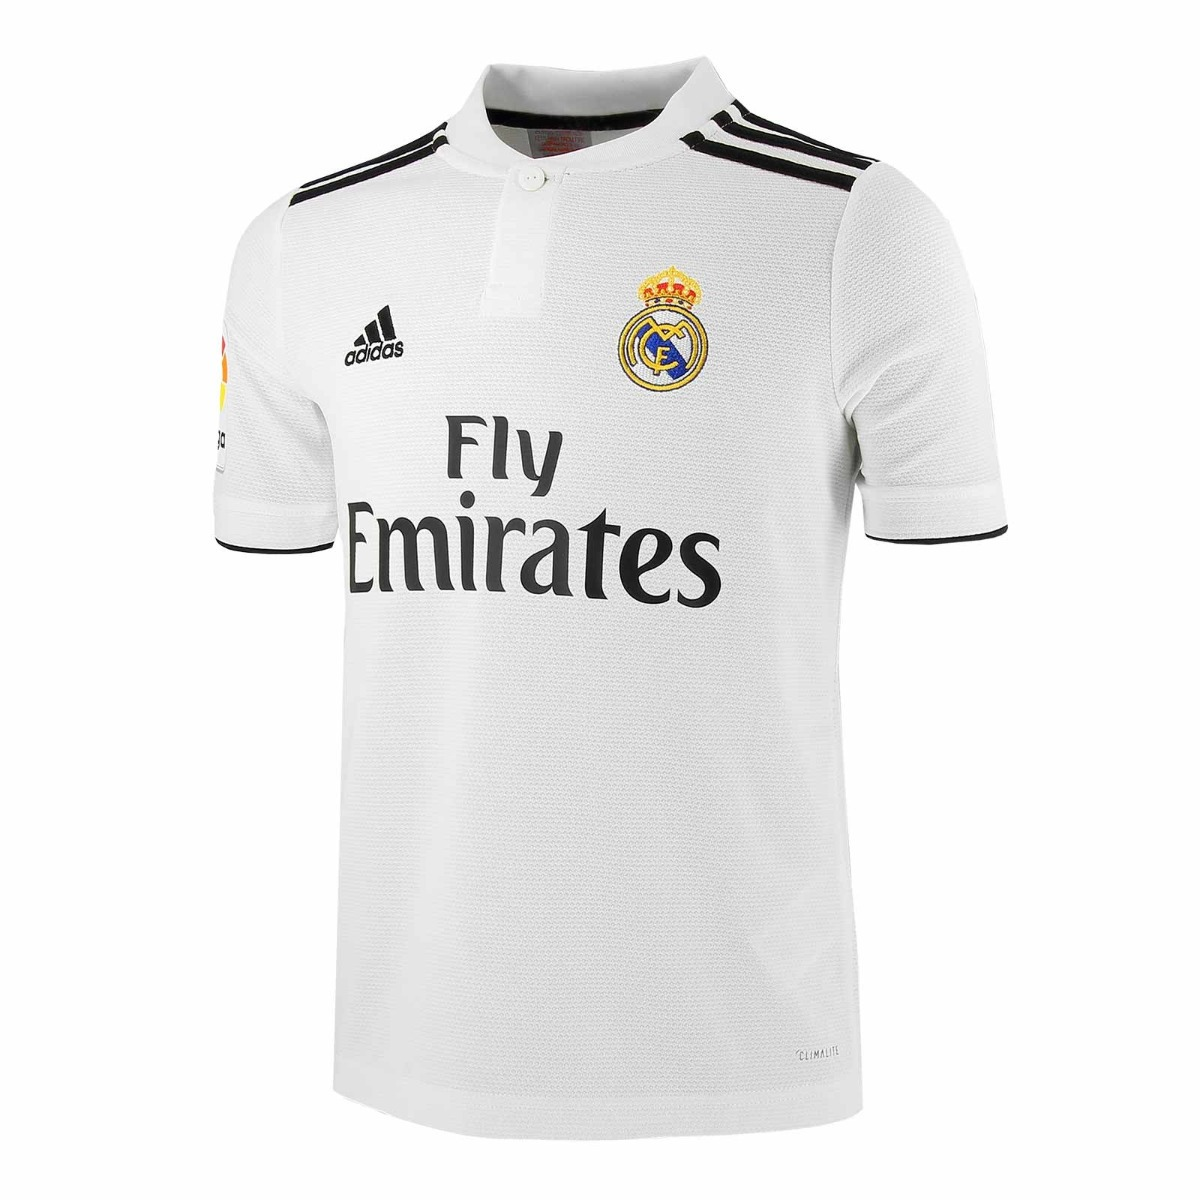 Camiseta De Fútbol Real Madrid Temporada 2018   2019 -   70.000 en ... 80bc770e3f31b